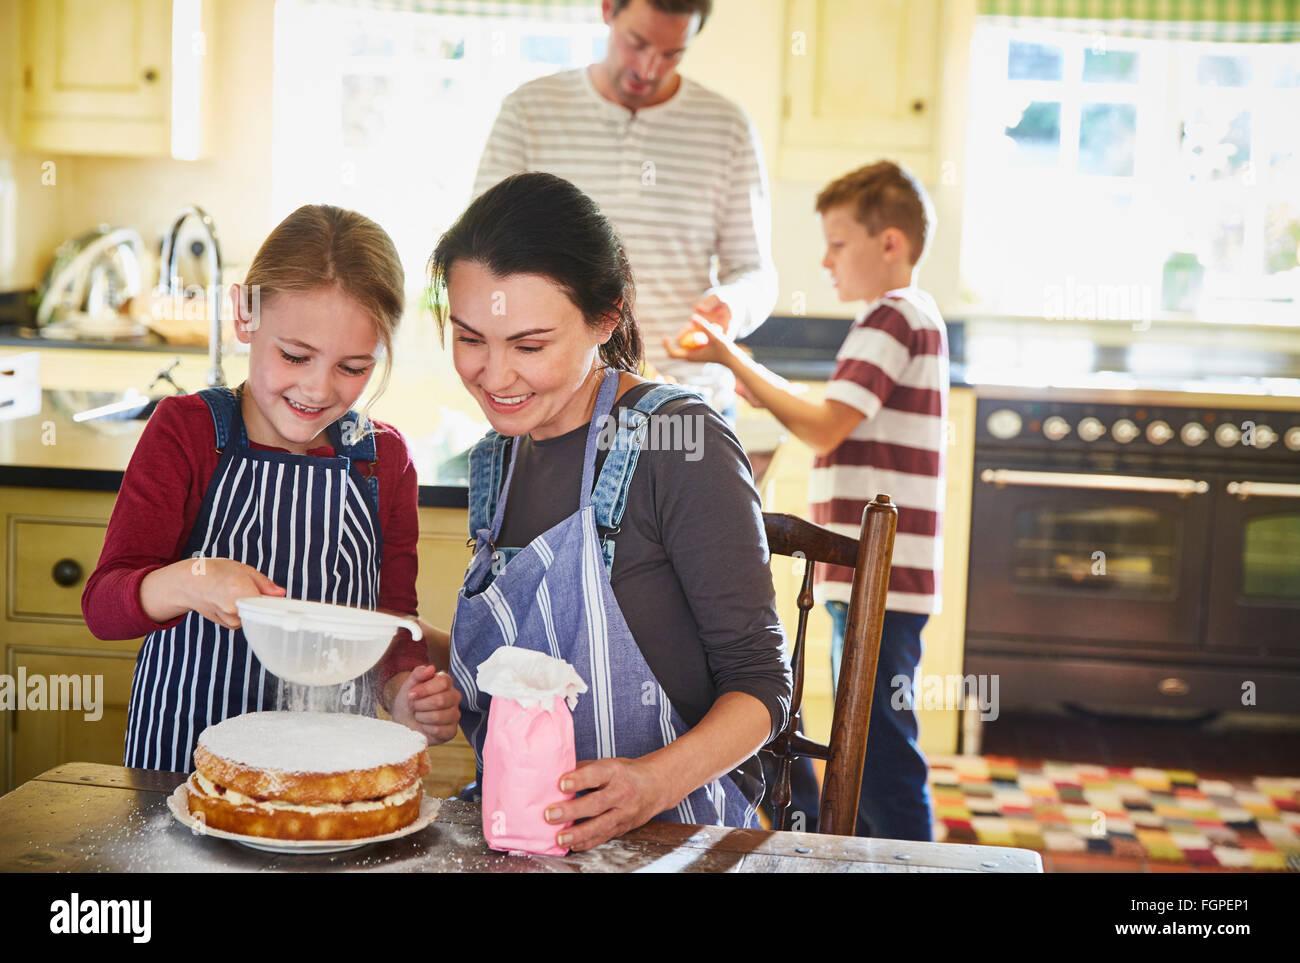 Family baking cake in kitchen - Stock Image